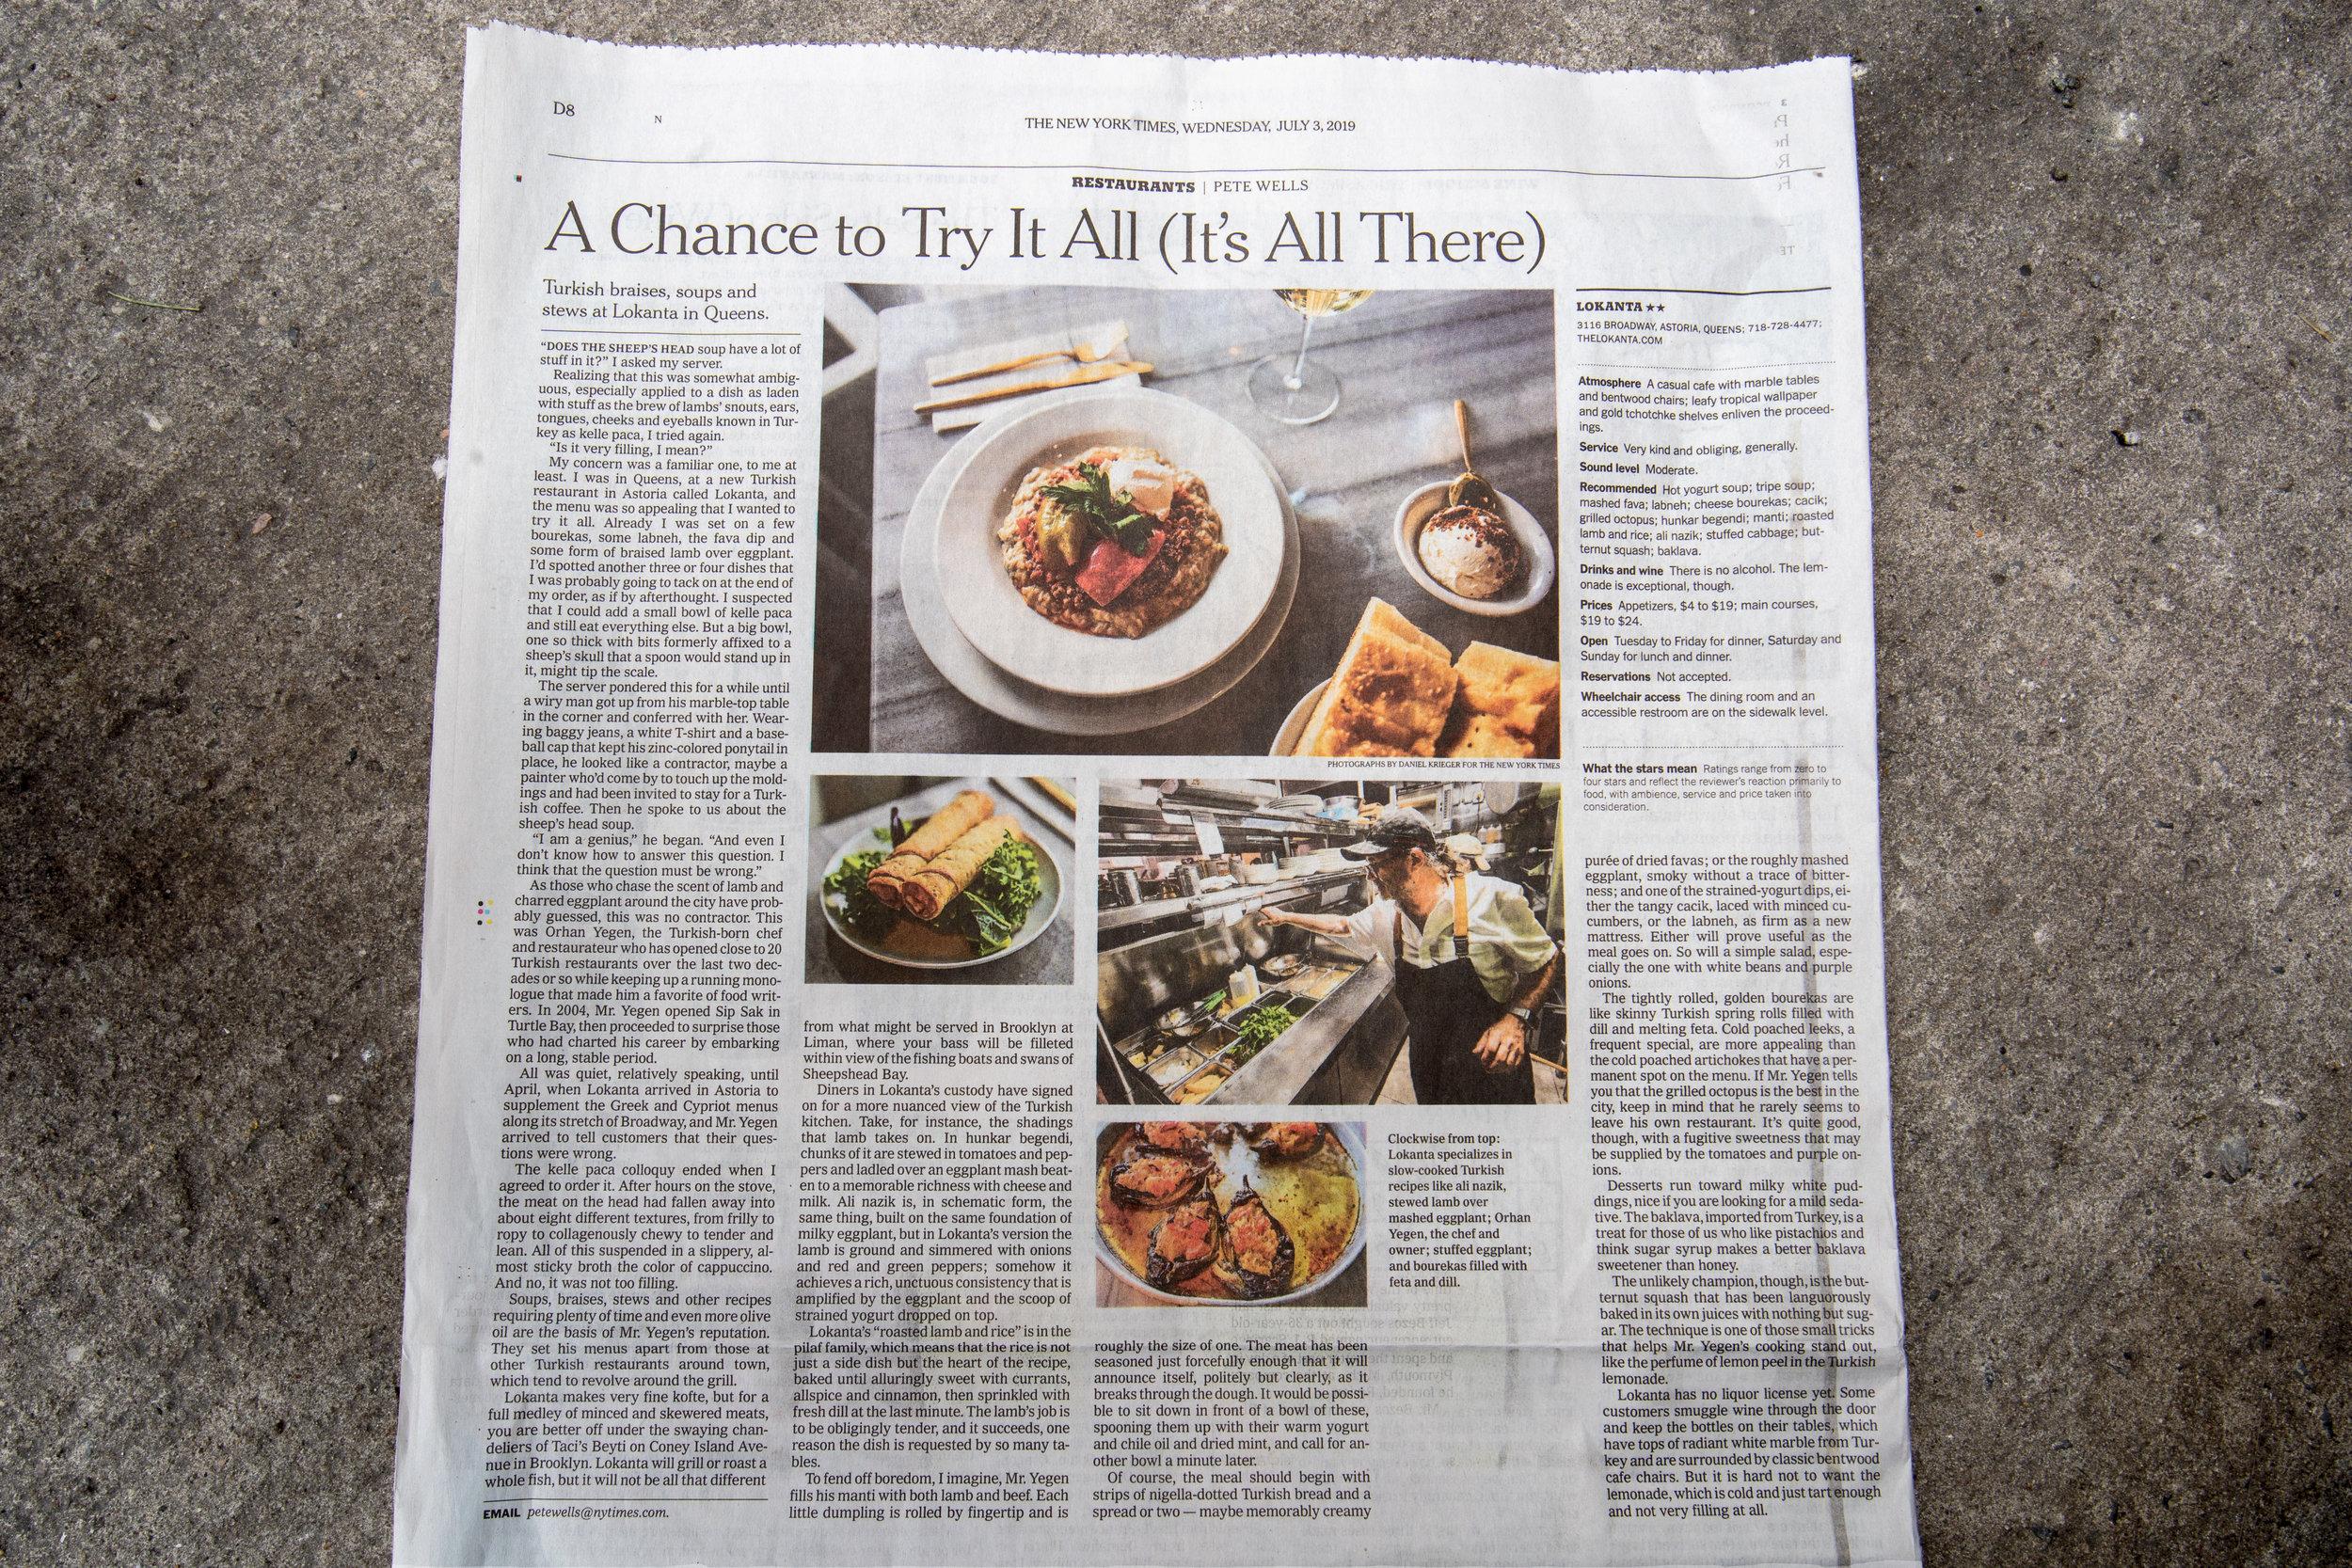 / NEW YORK TIMES I FOOD I JULY 03, 2019 /